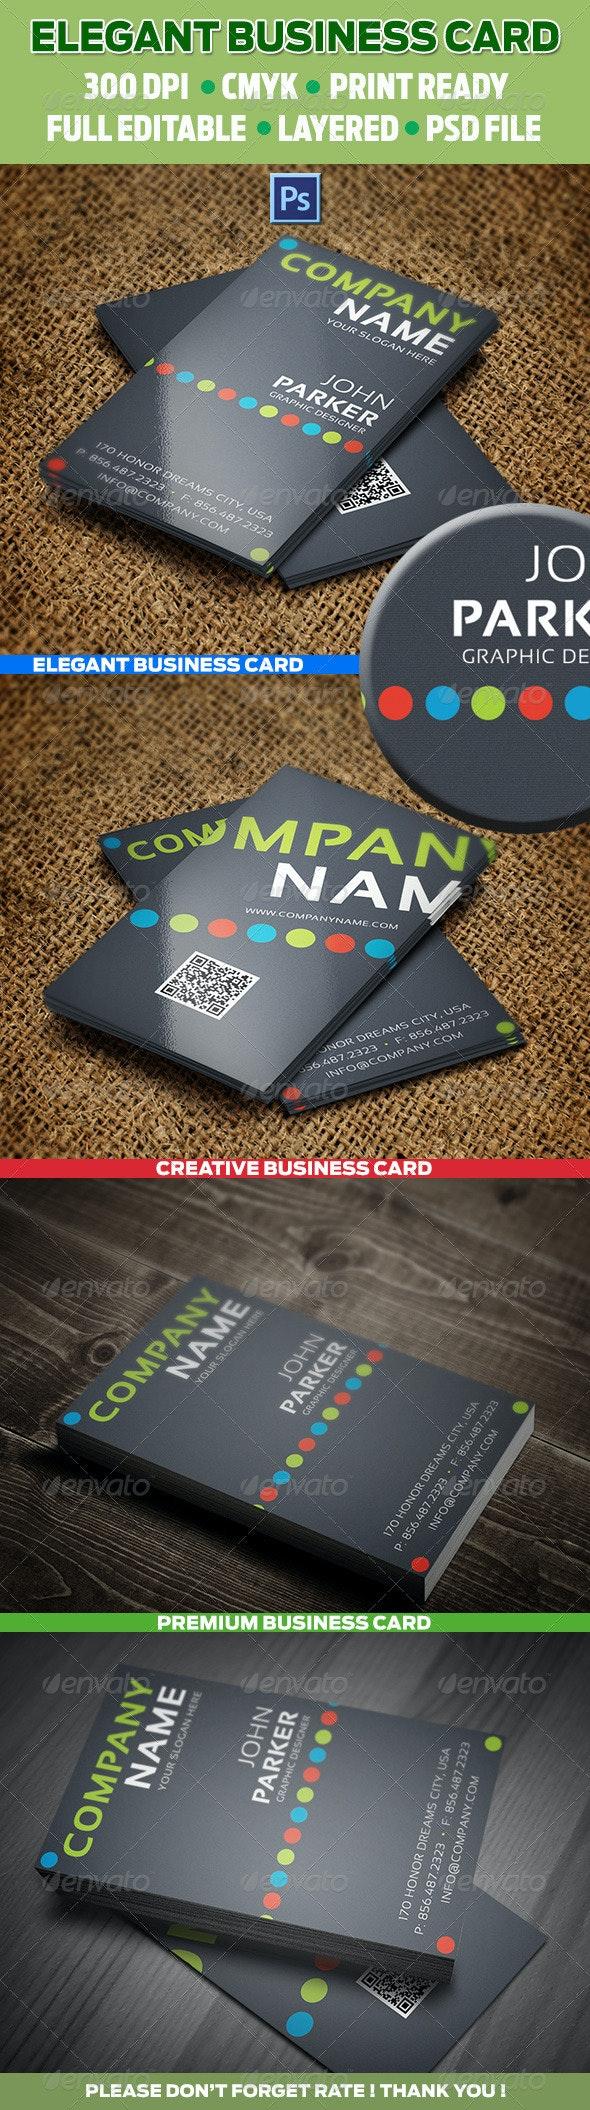 Creative Business Cards 17 - Creative Business Cards